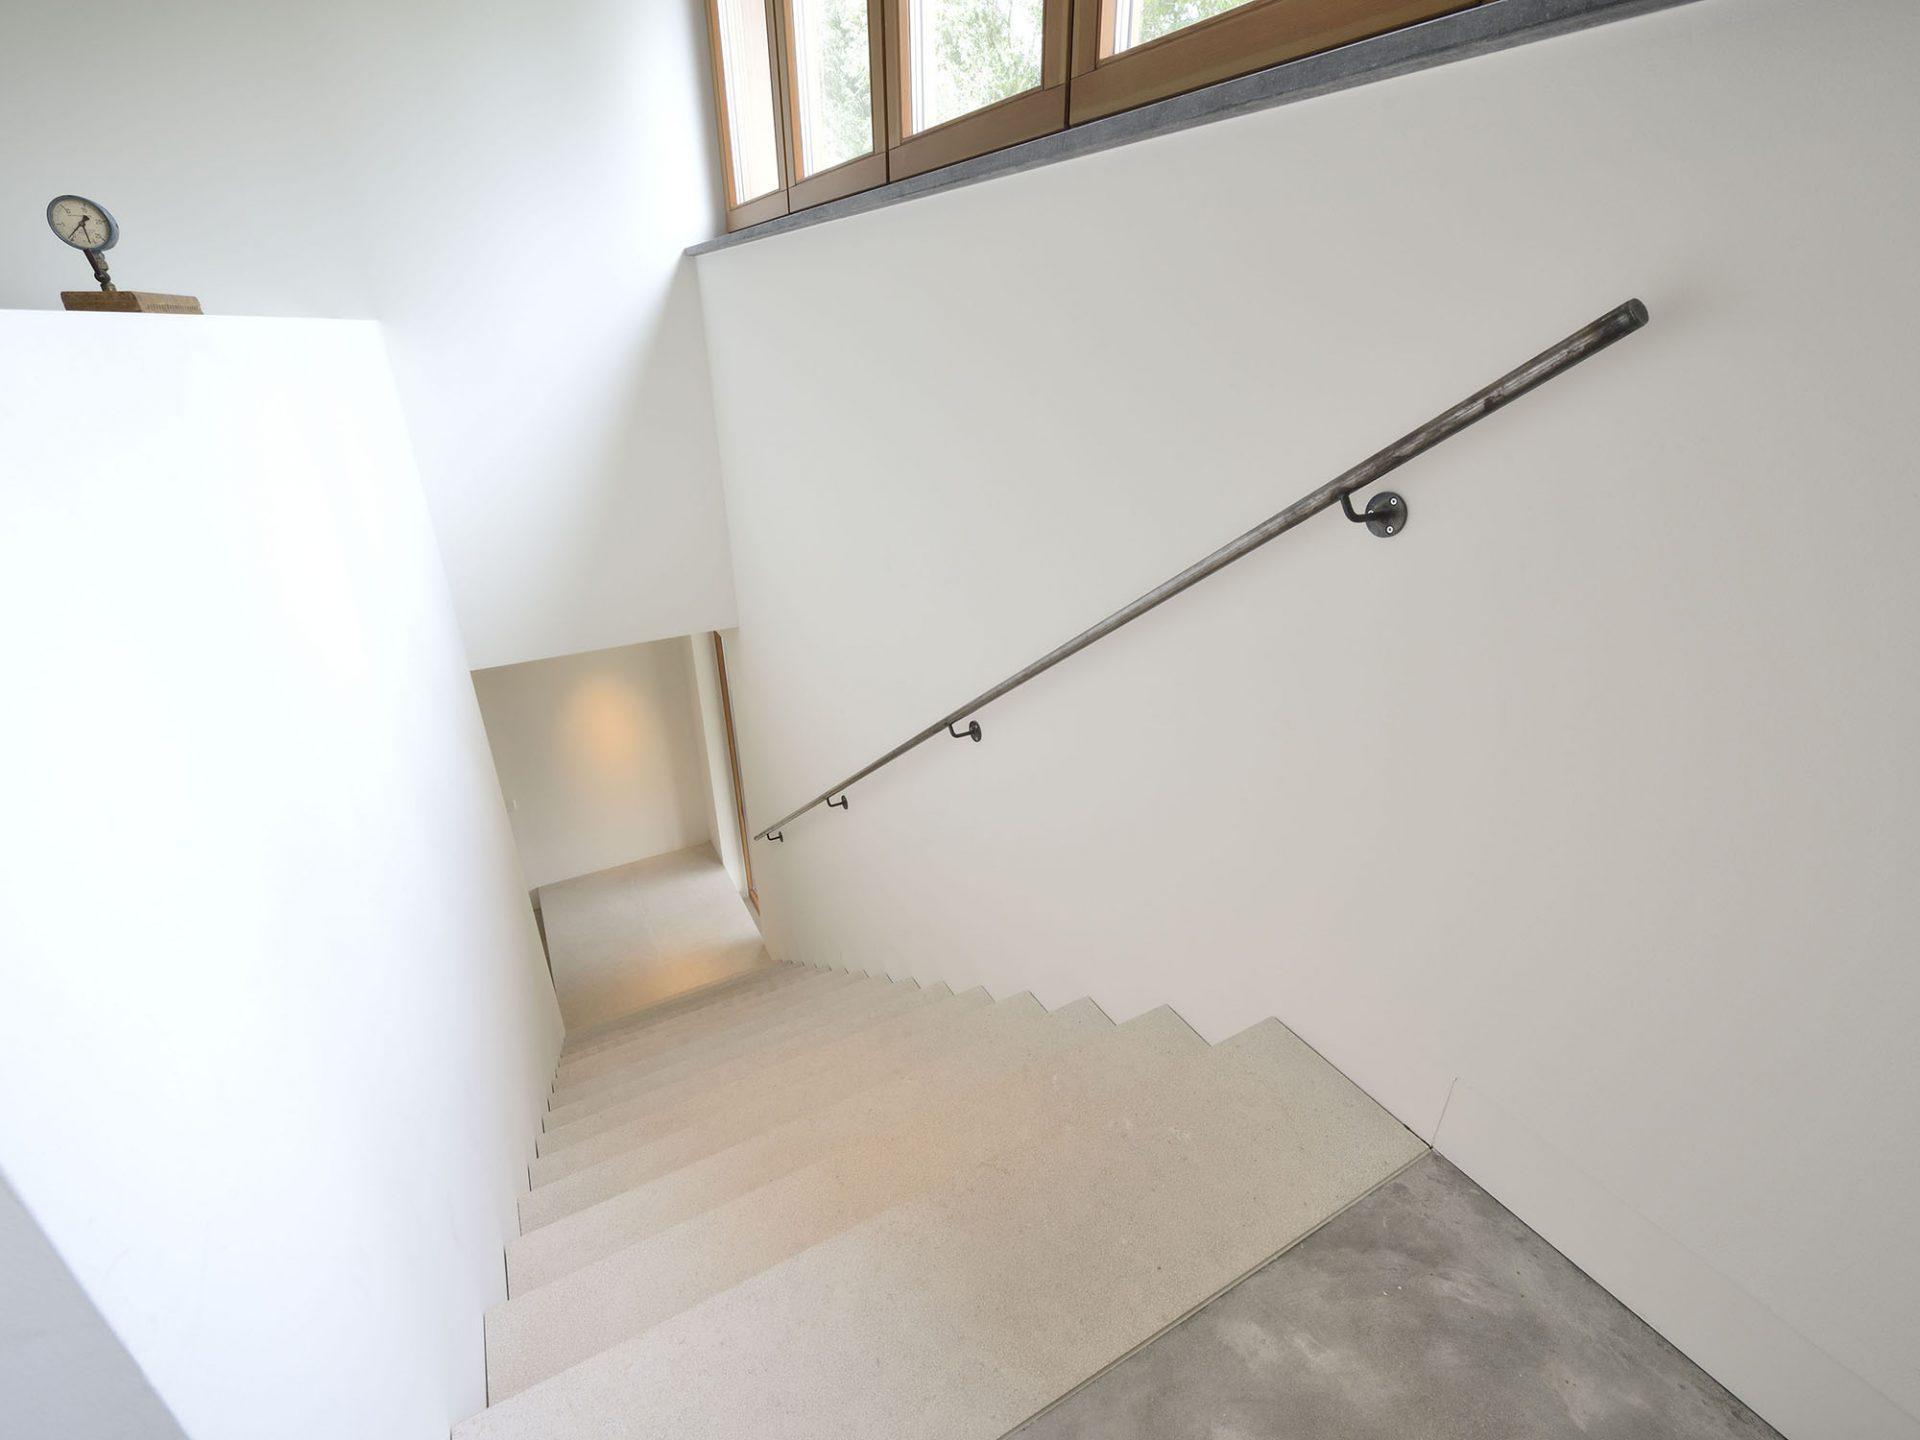 Inrichting Slaapkamer Modern : Slaapkamer inrichting: modern residential living emyko